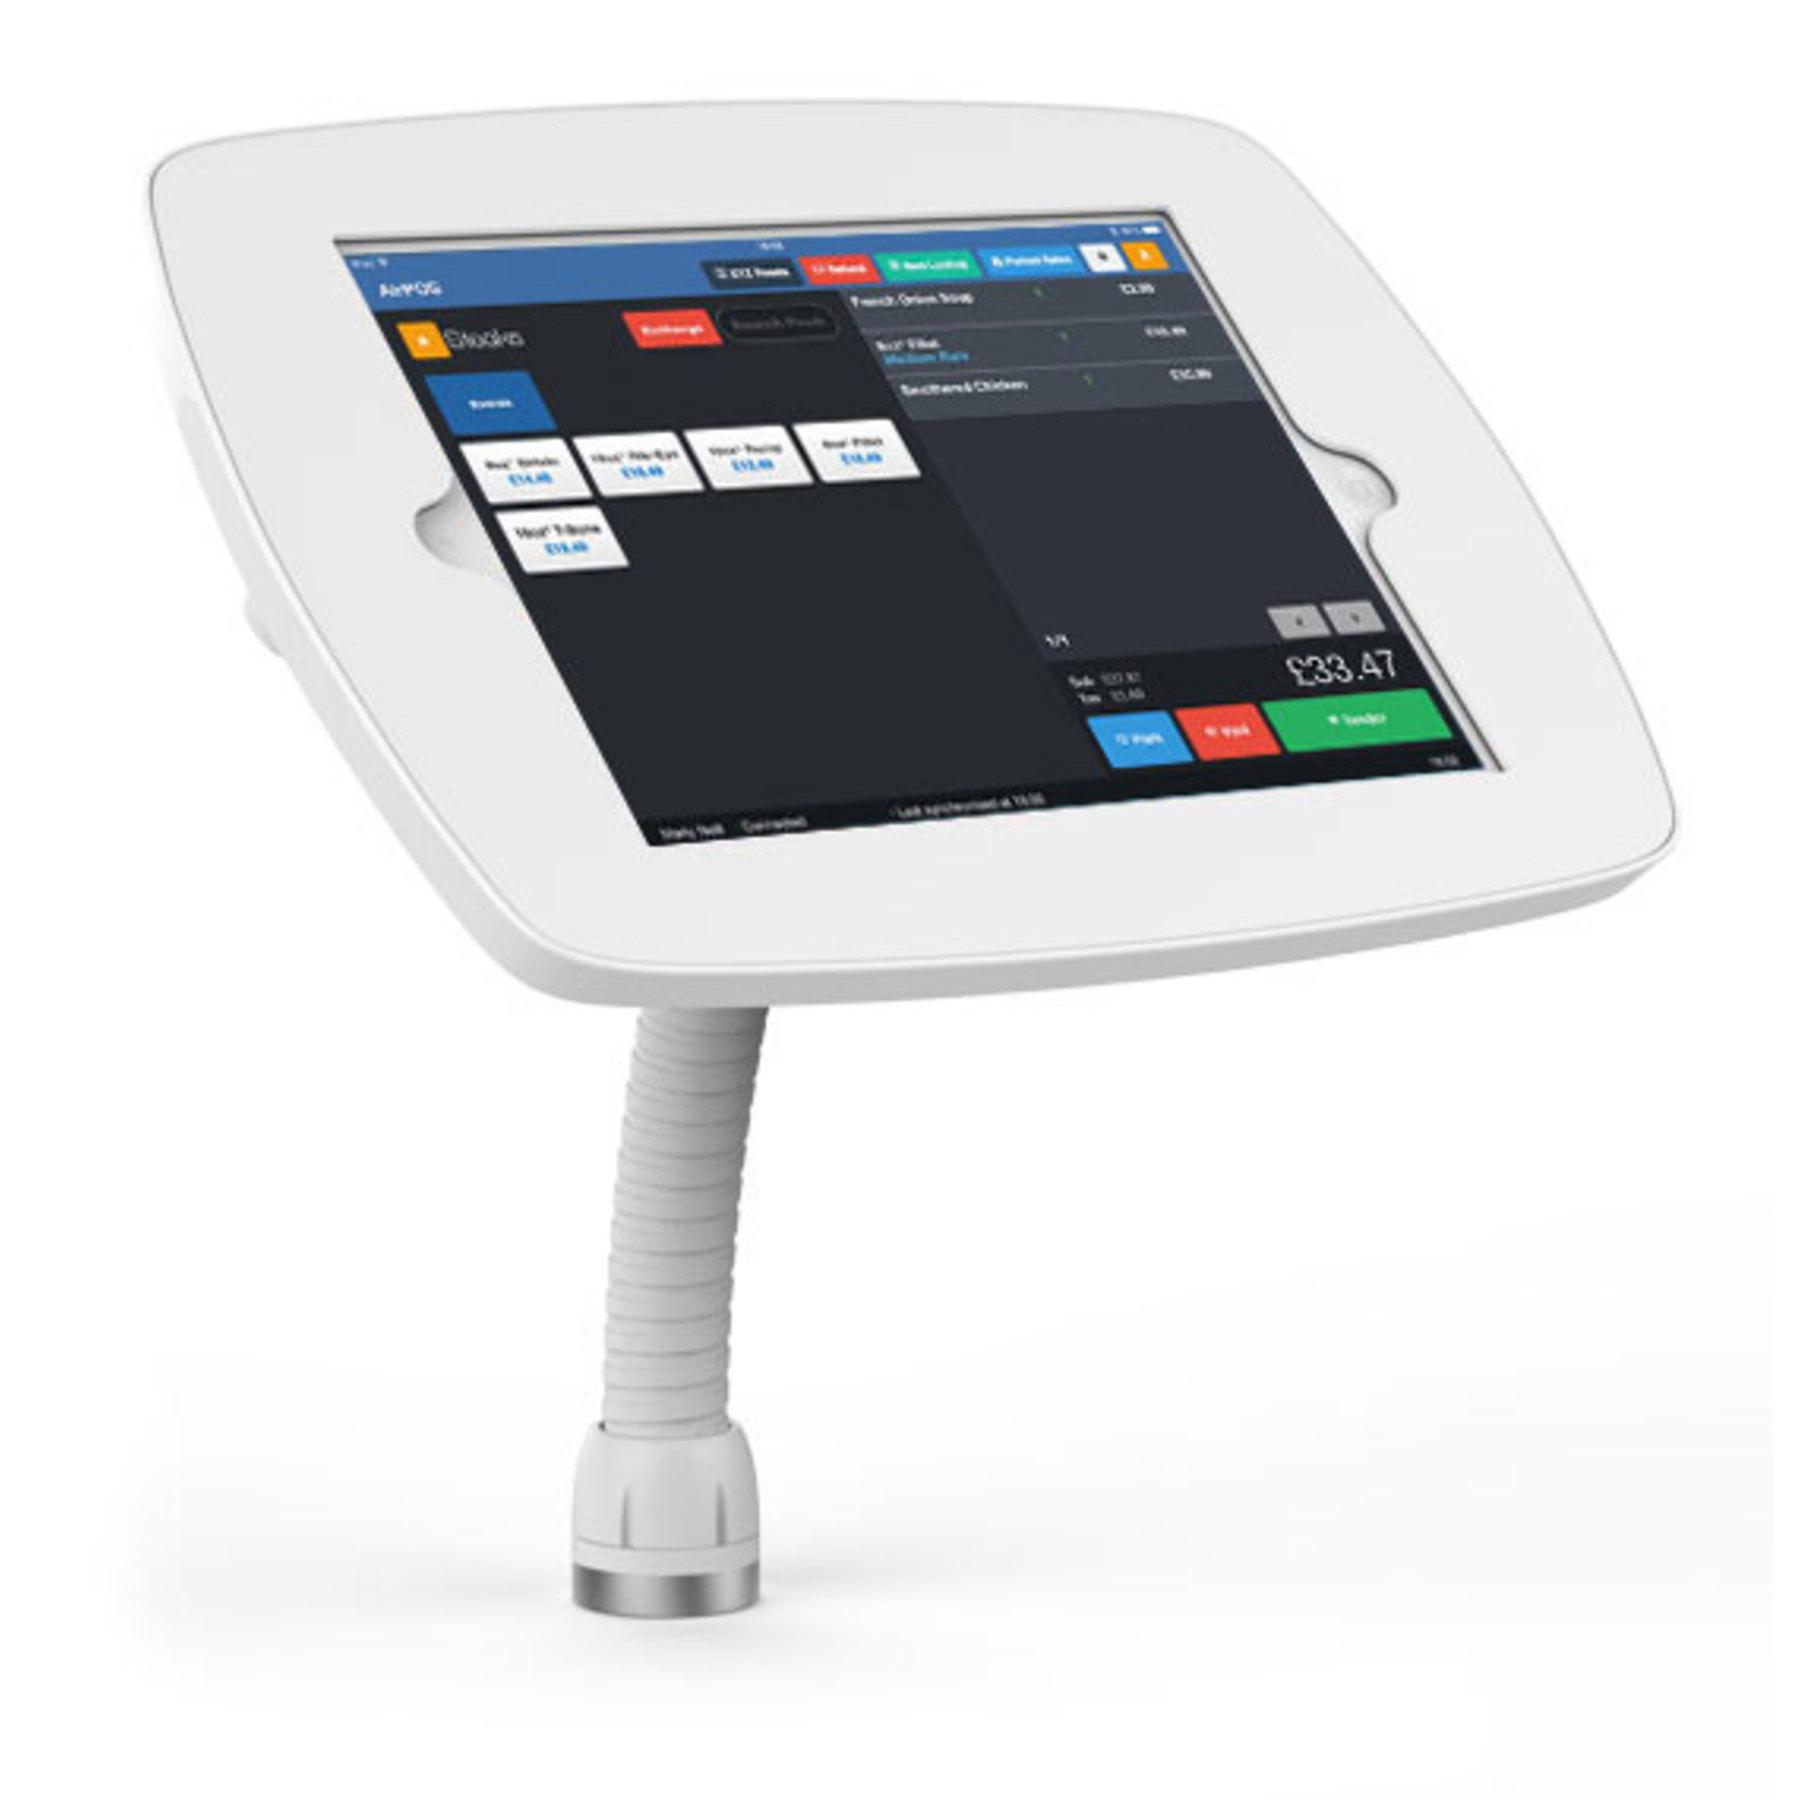 Bouncepad Flex Samsung Tab Mount With Flexible Arm Cash